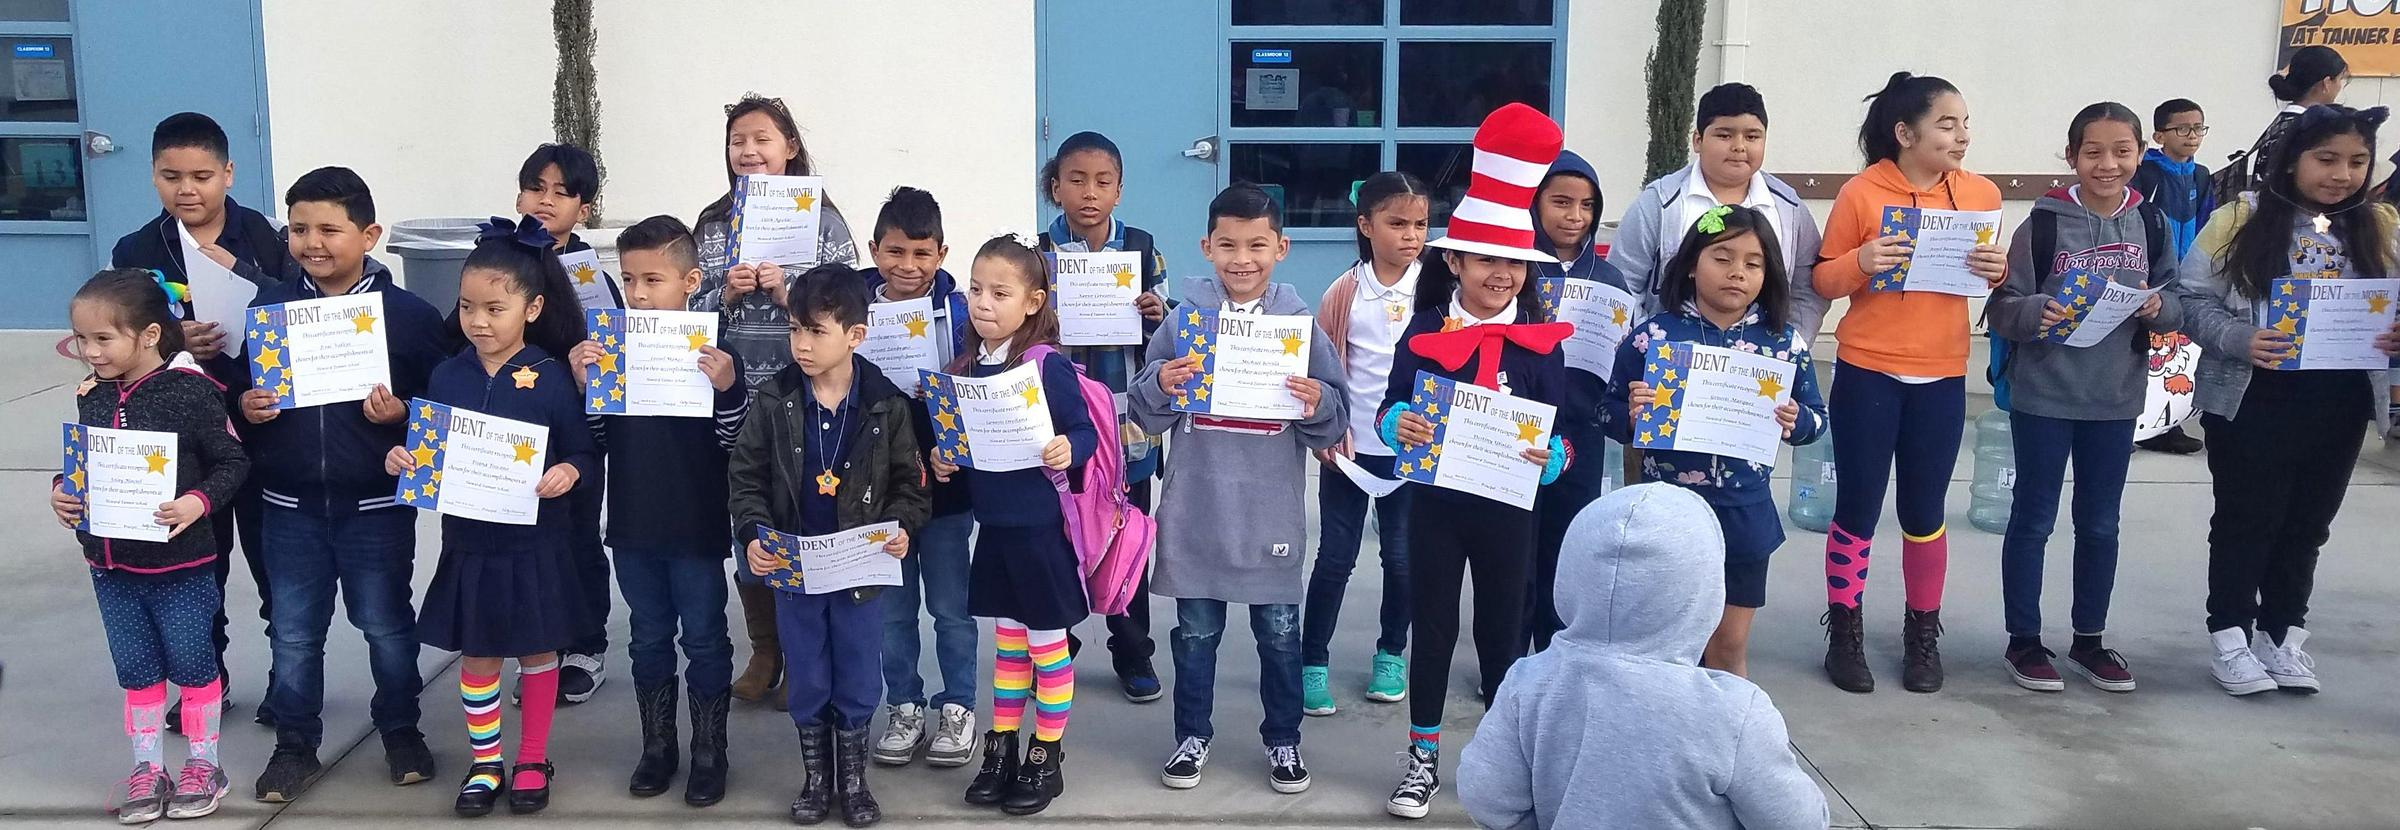 Howard Tanner Elementary School